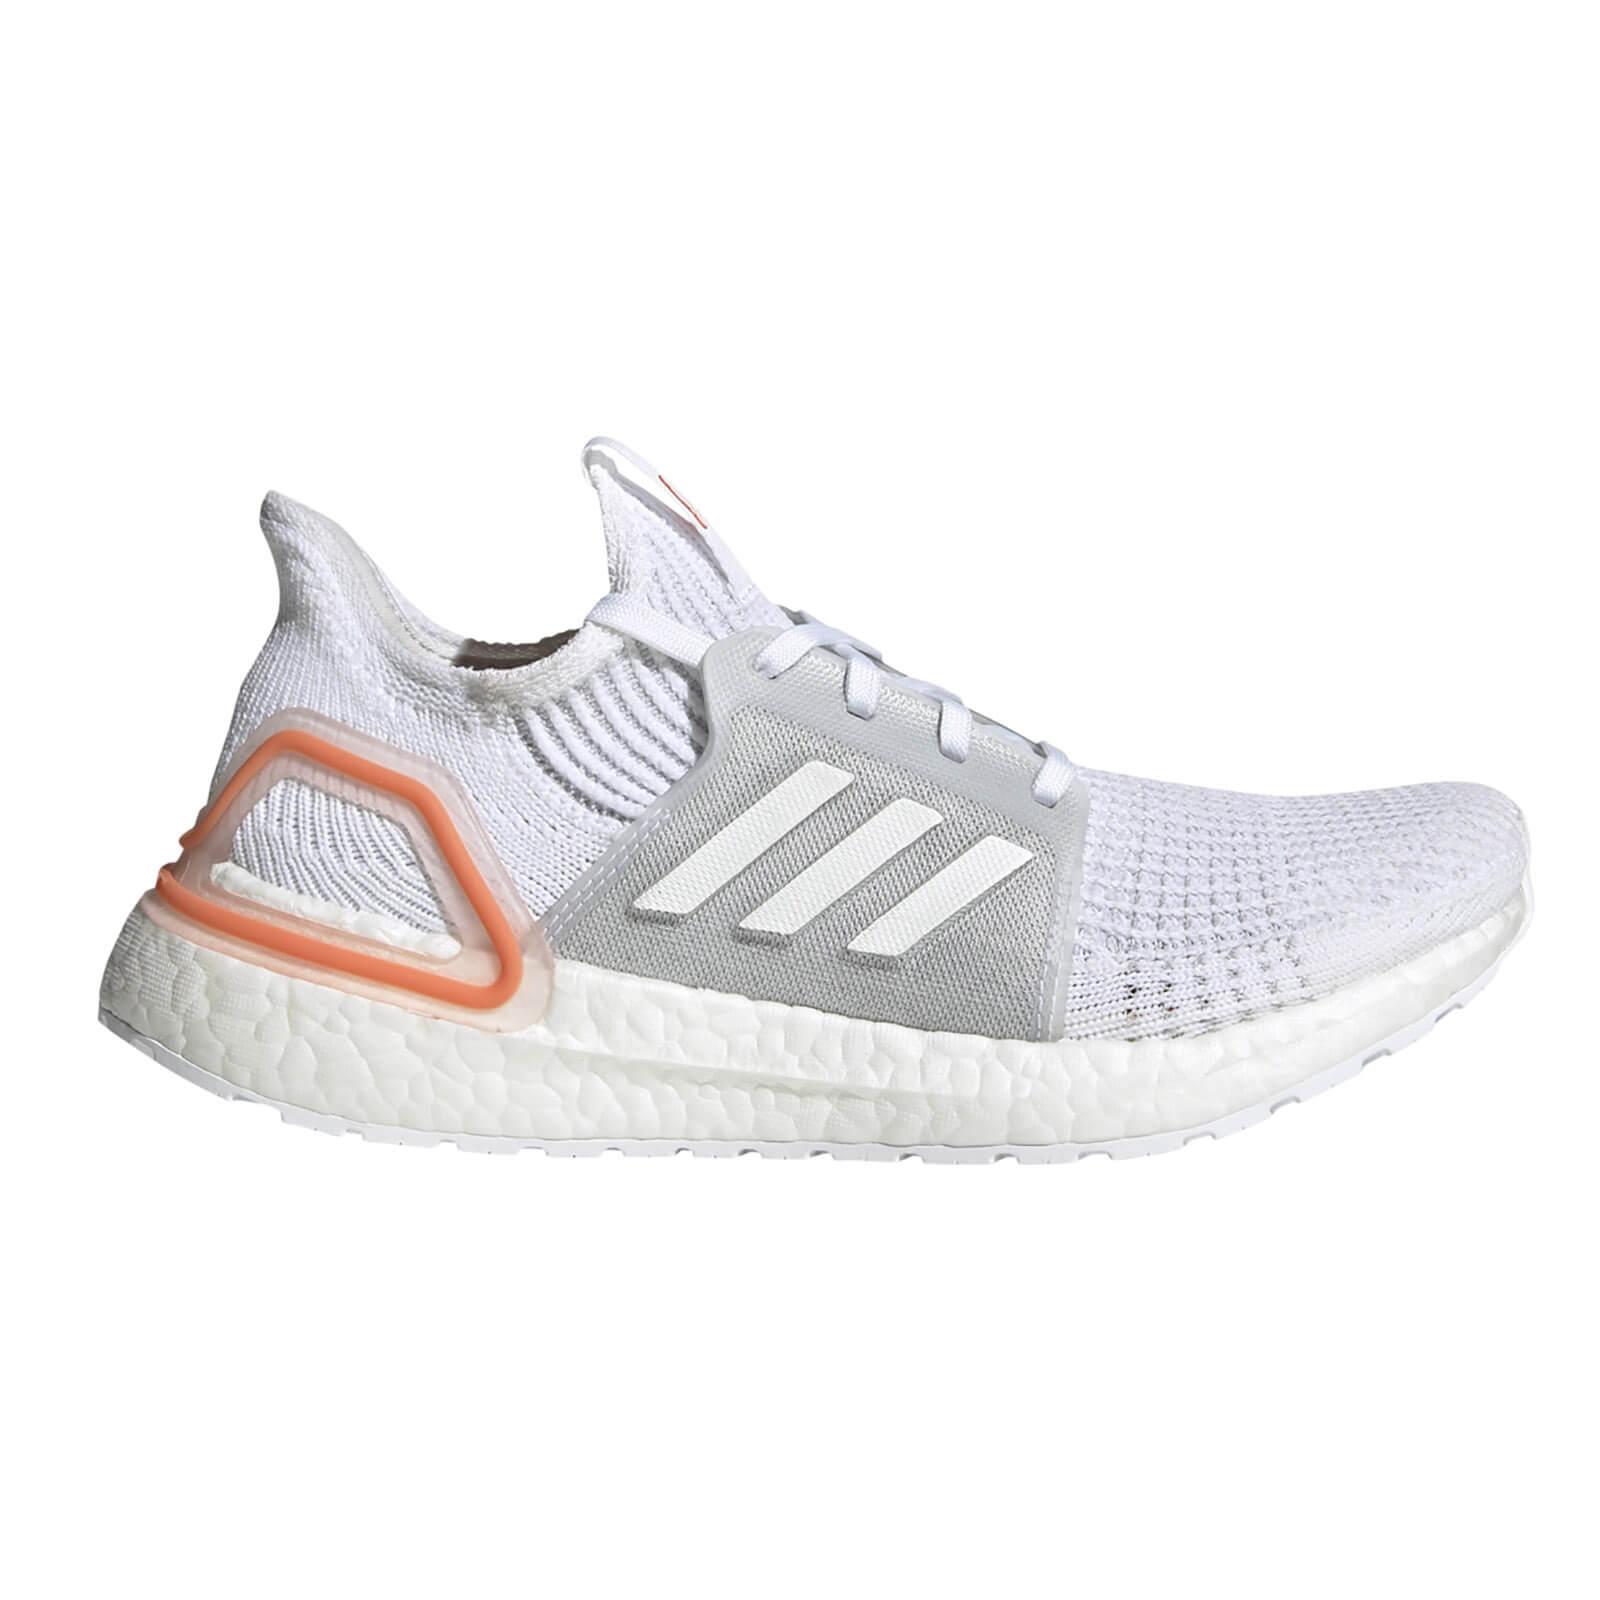 adidas Women's Ultraboost 19 Running Shoes White